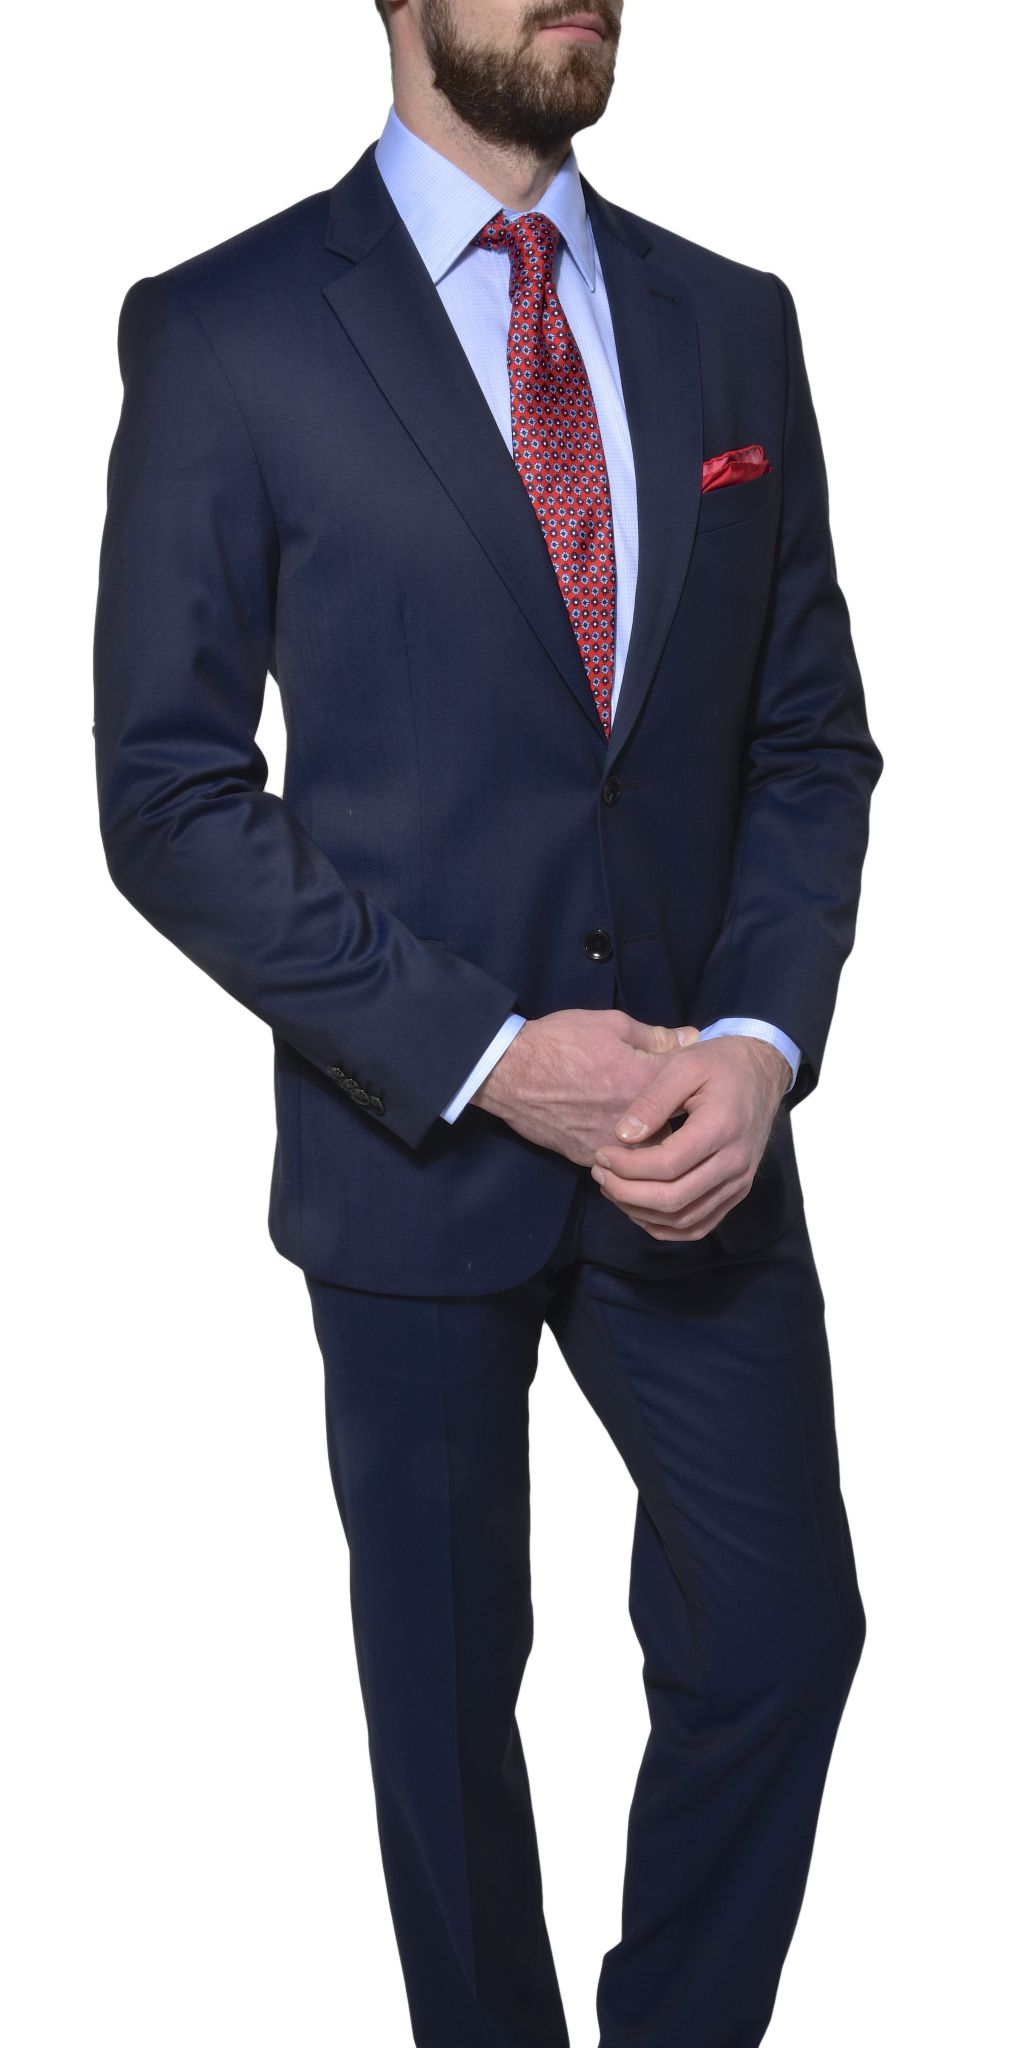 967026f5d3fd Tmavomodrý vlnený Slim Fit oblek - Obleky - E-shop